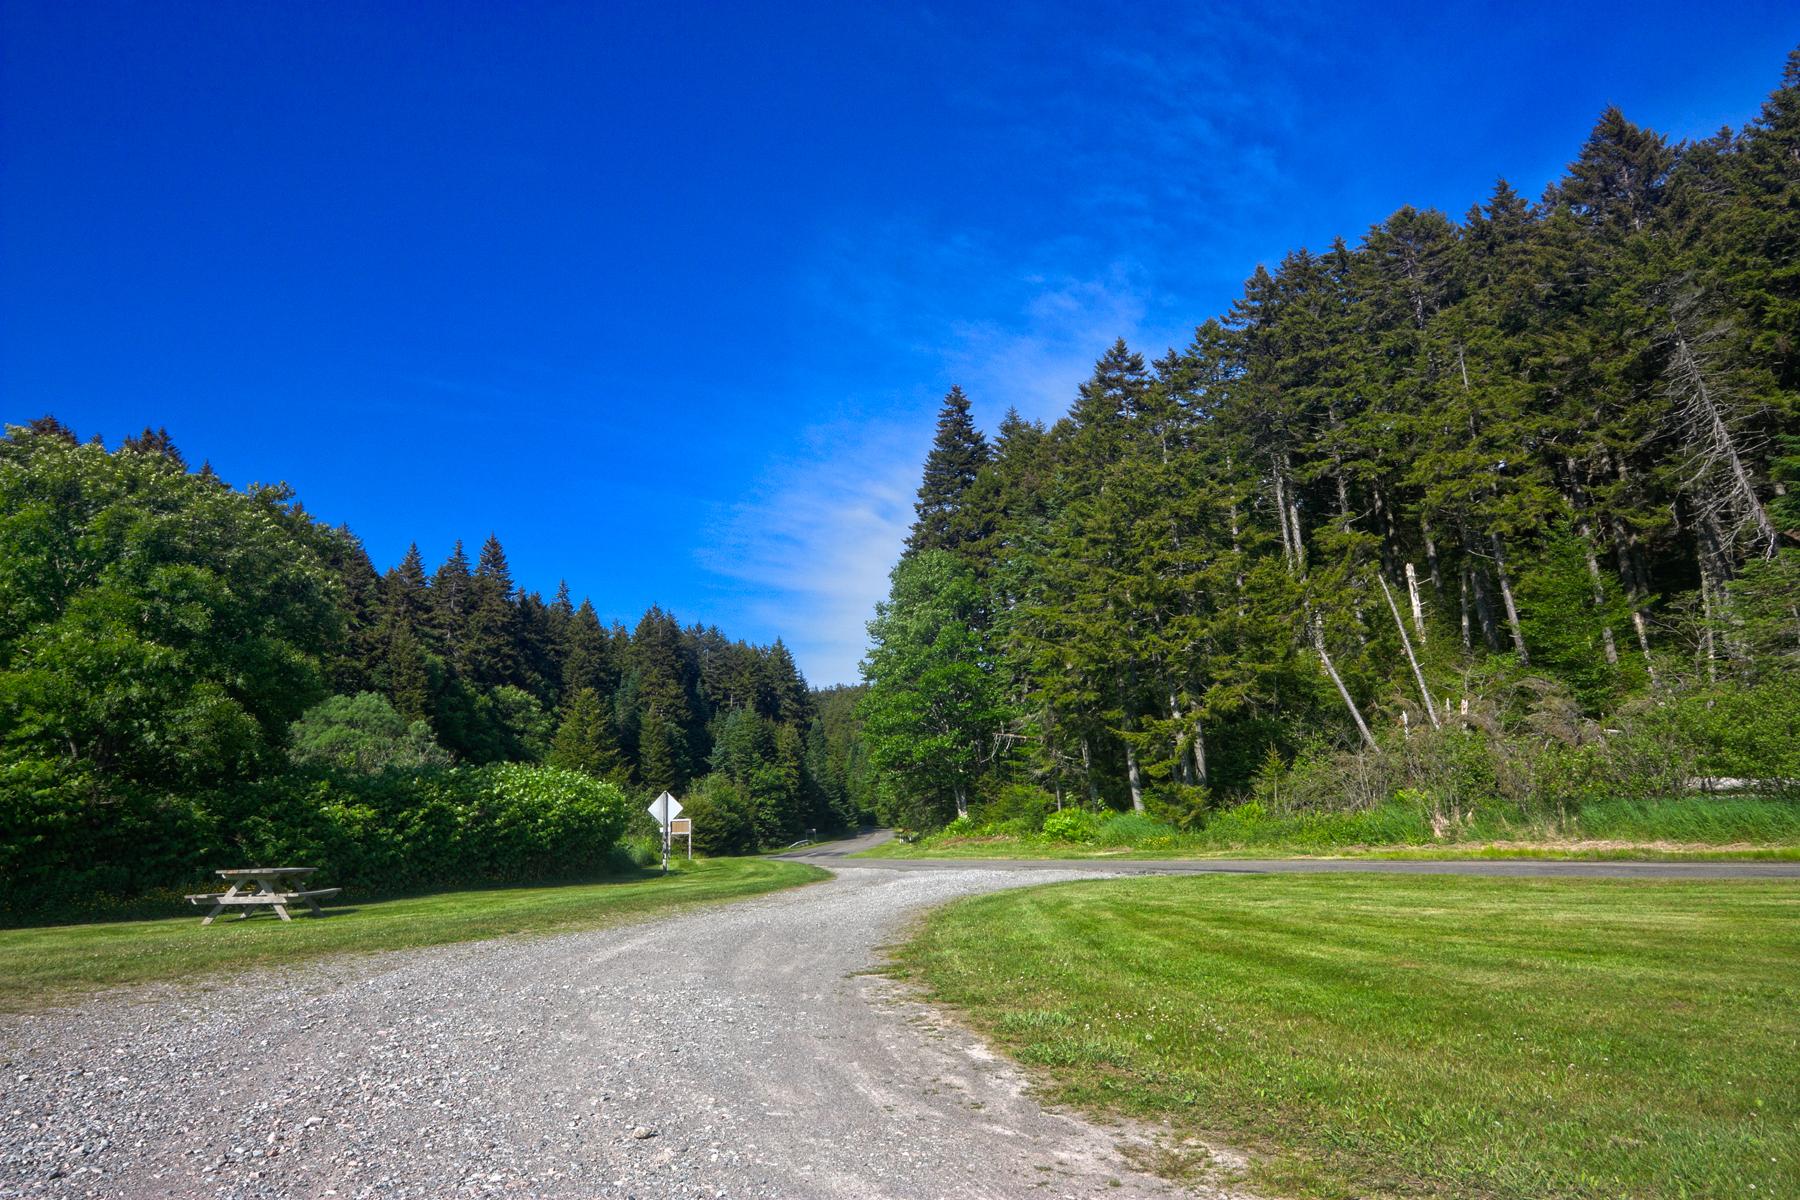 Fundy Scenery v2 - HDR by somadjinn